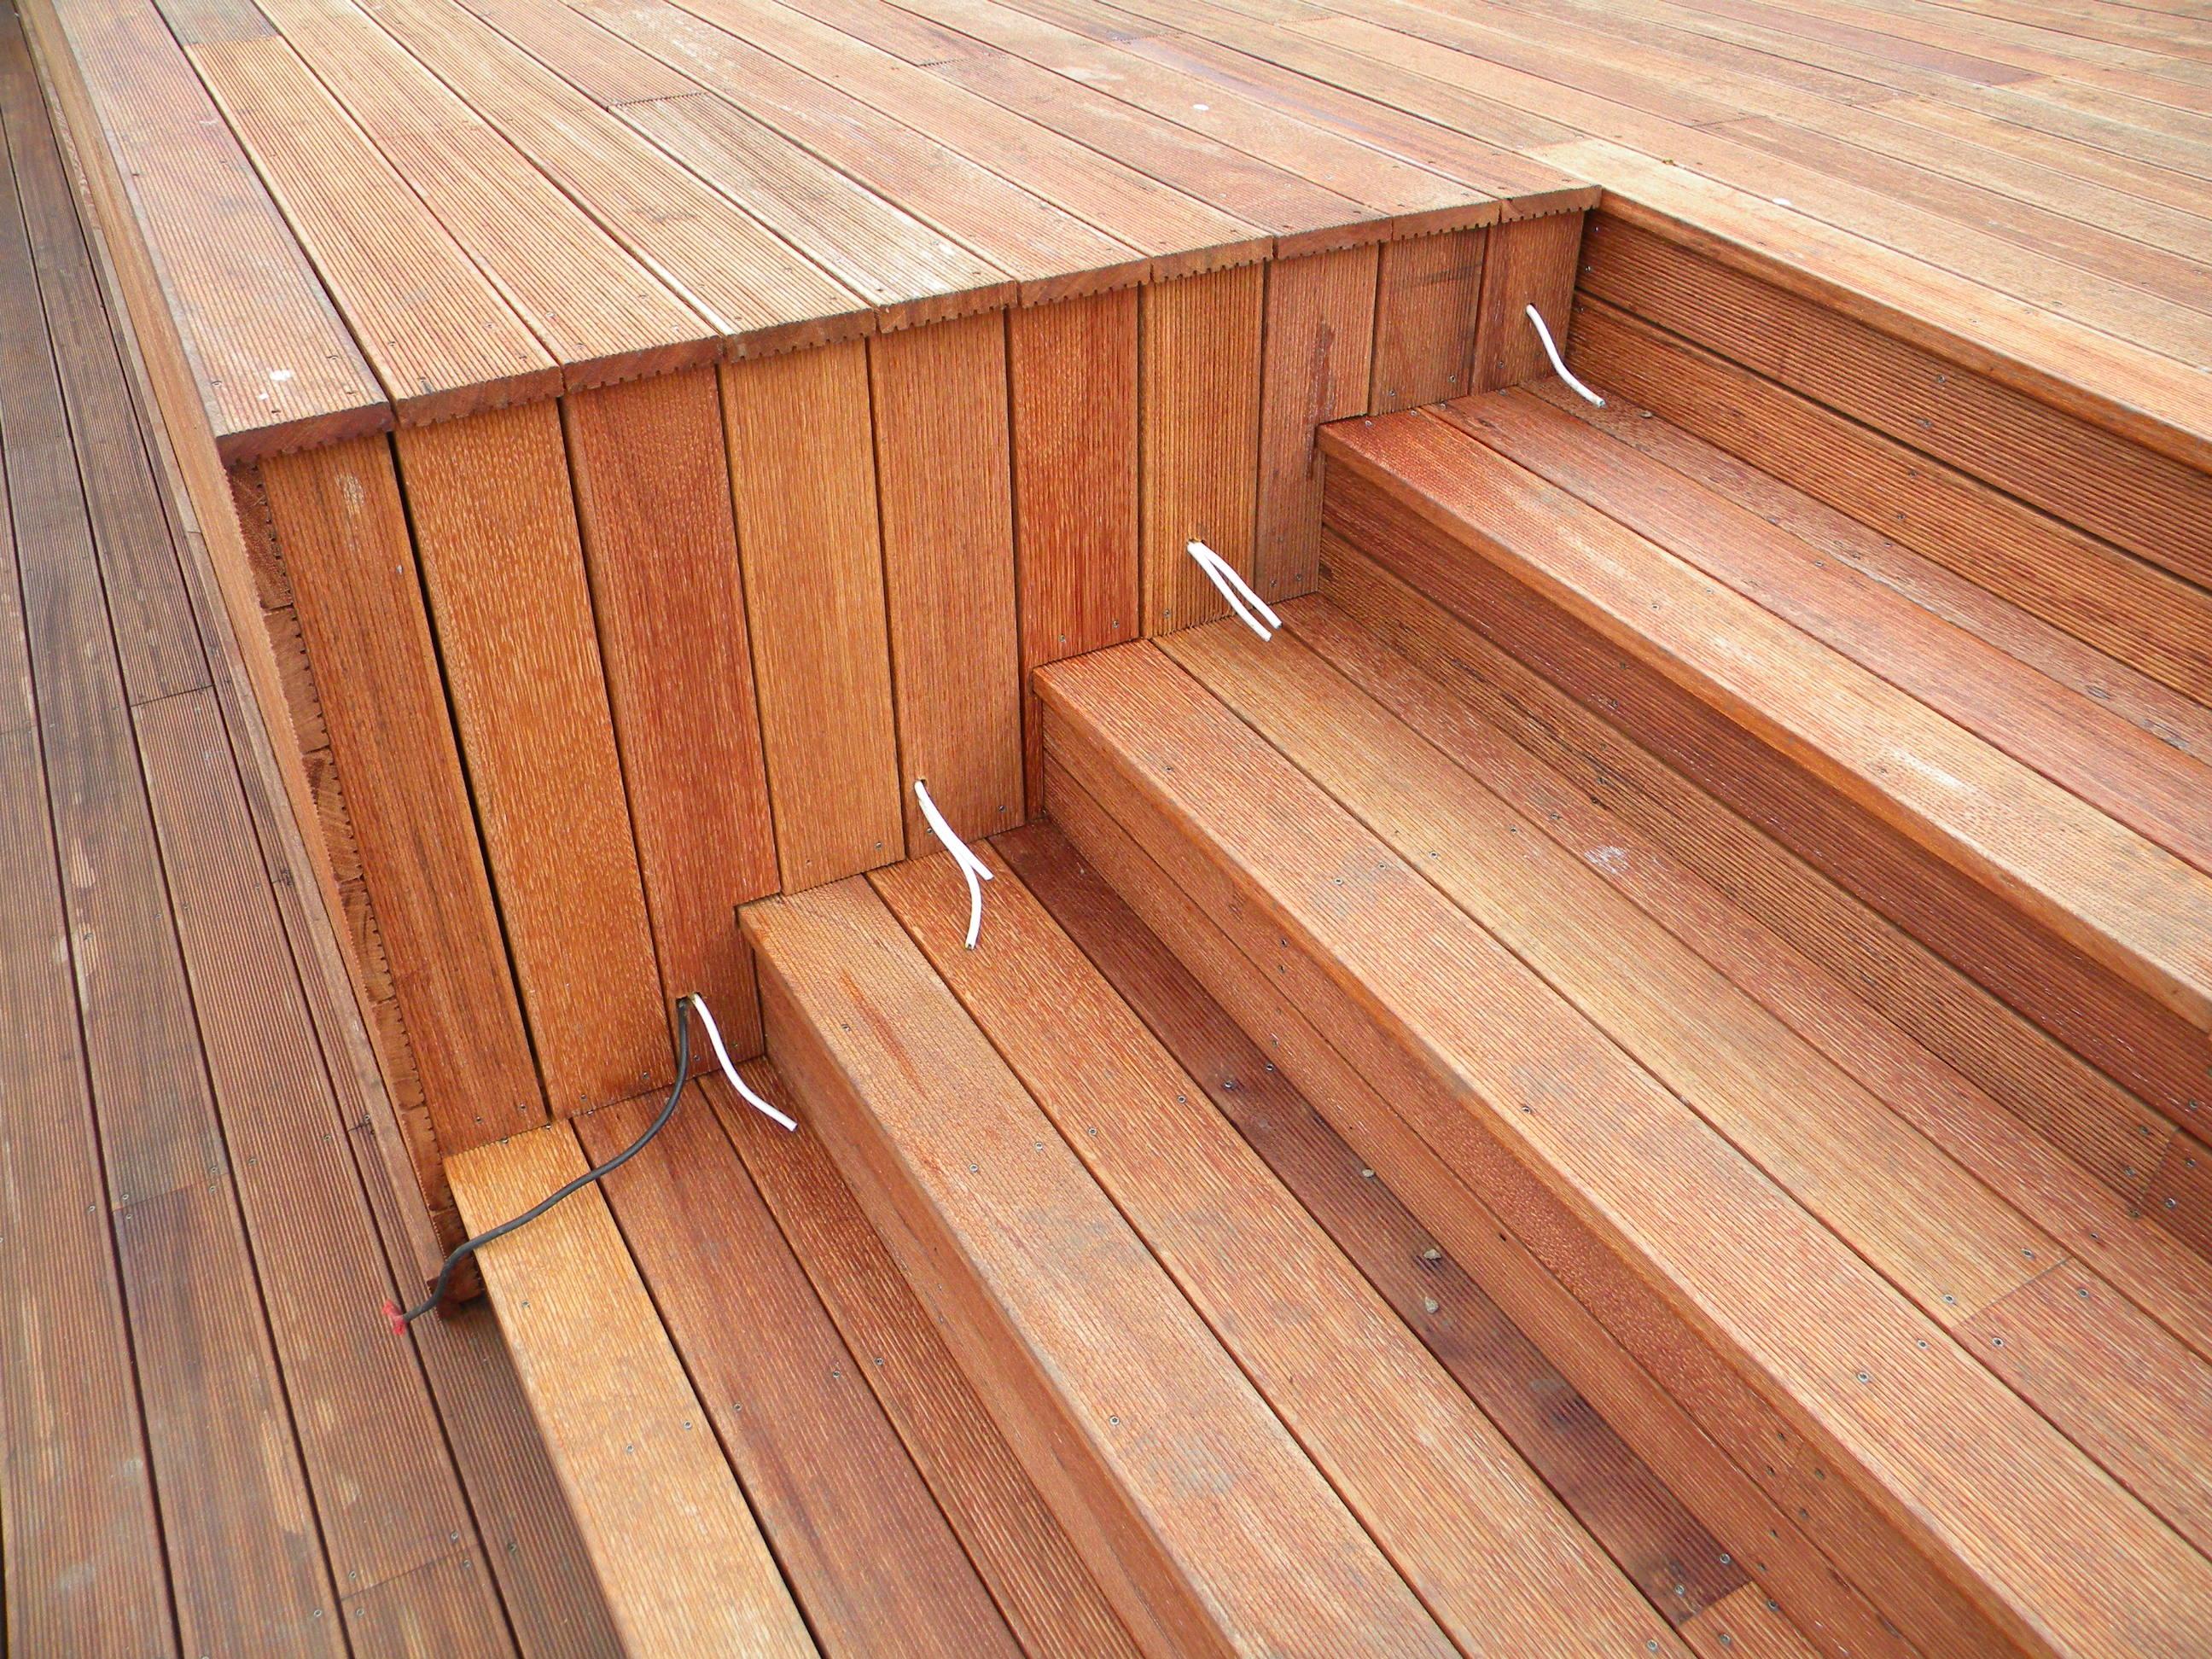 Deck-uri lemn - Angelim Pedra SELVA FLOORS - Poza 15